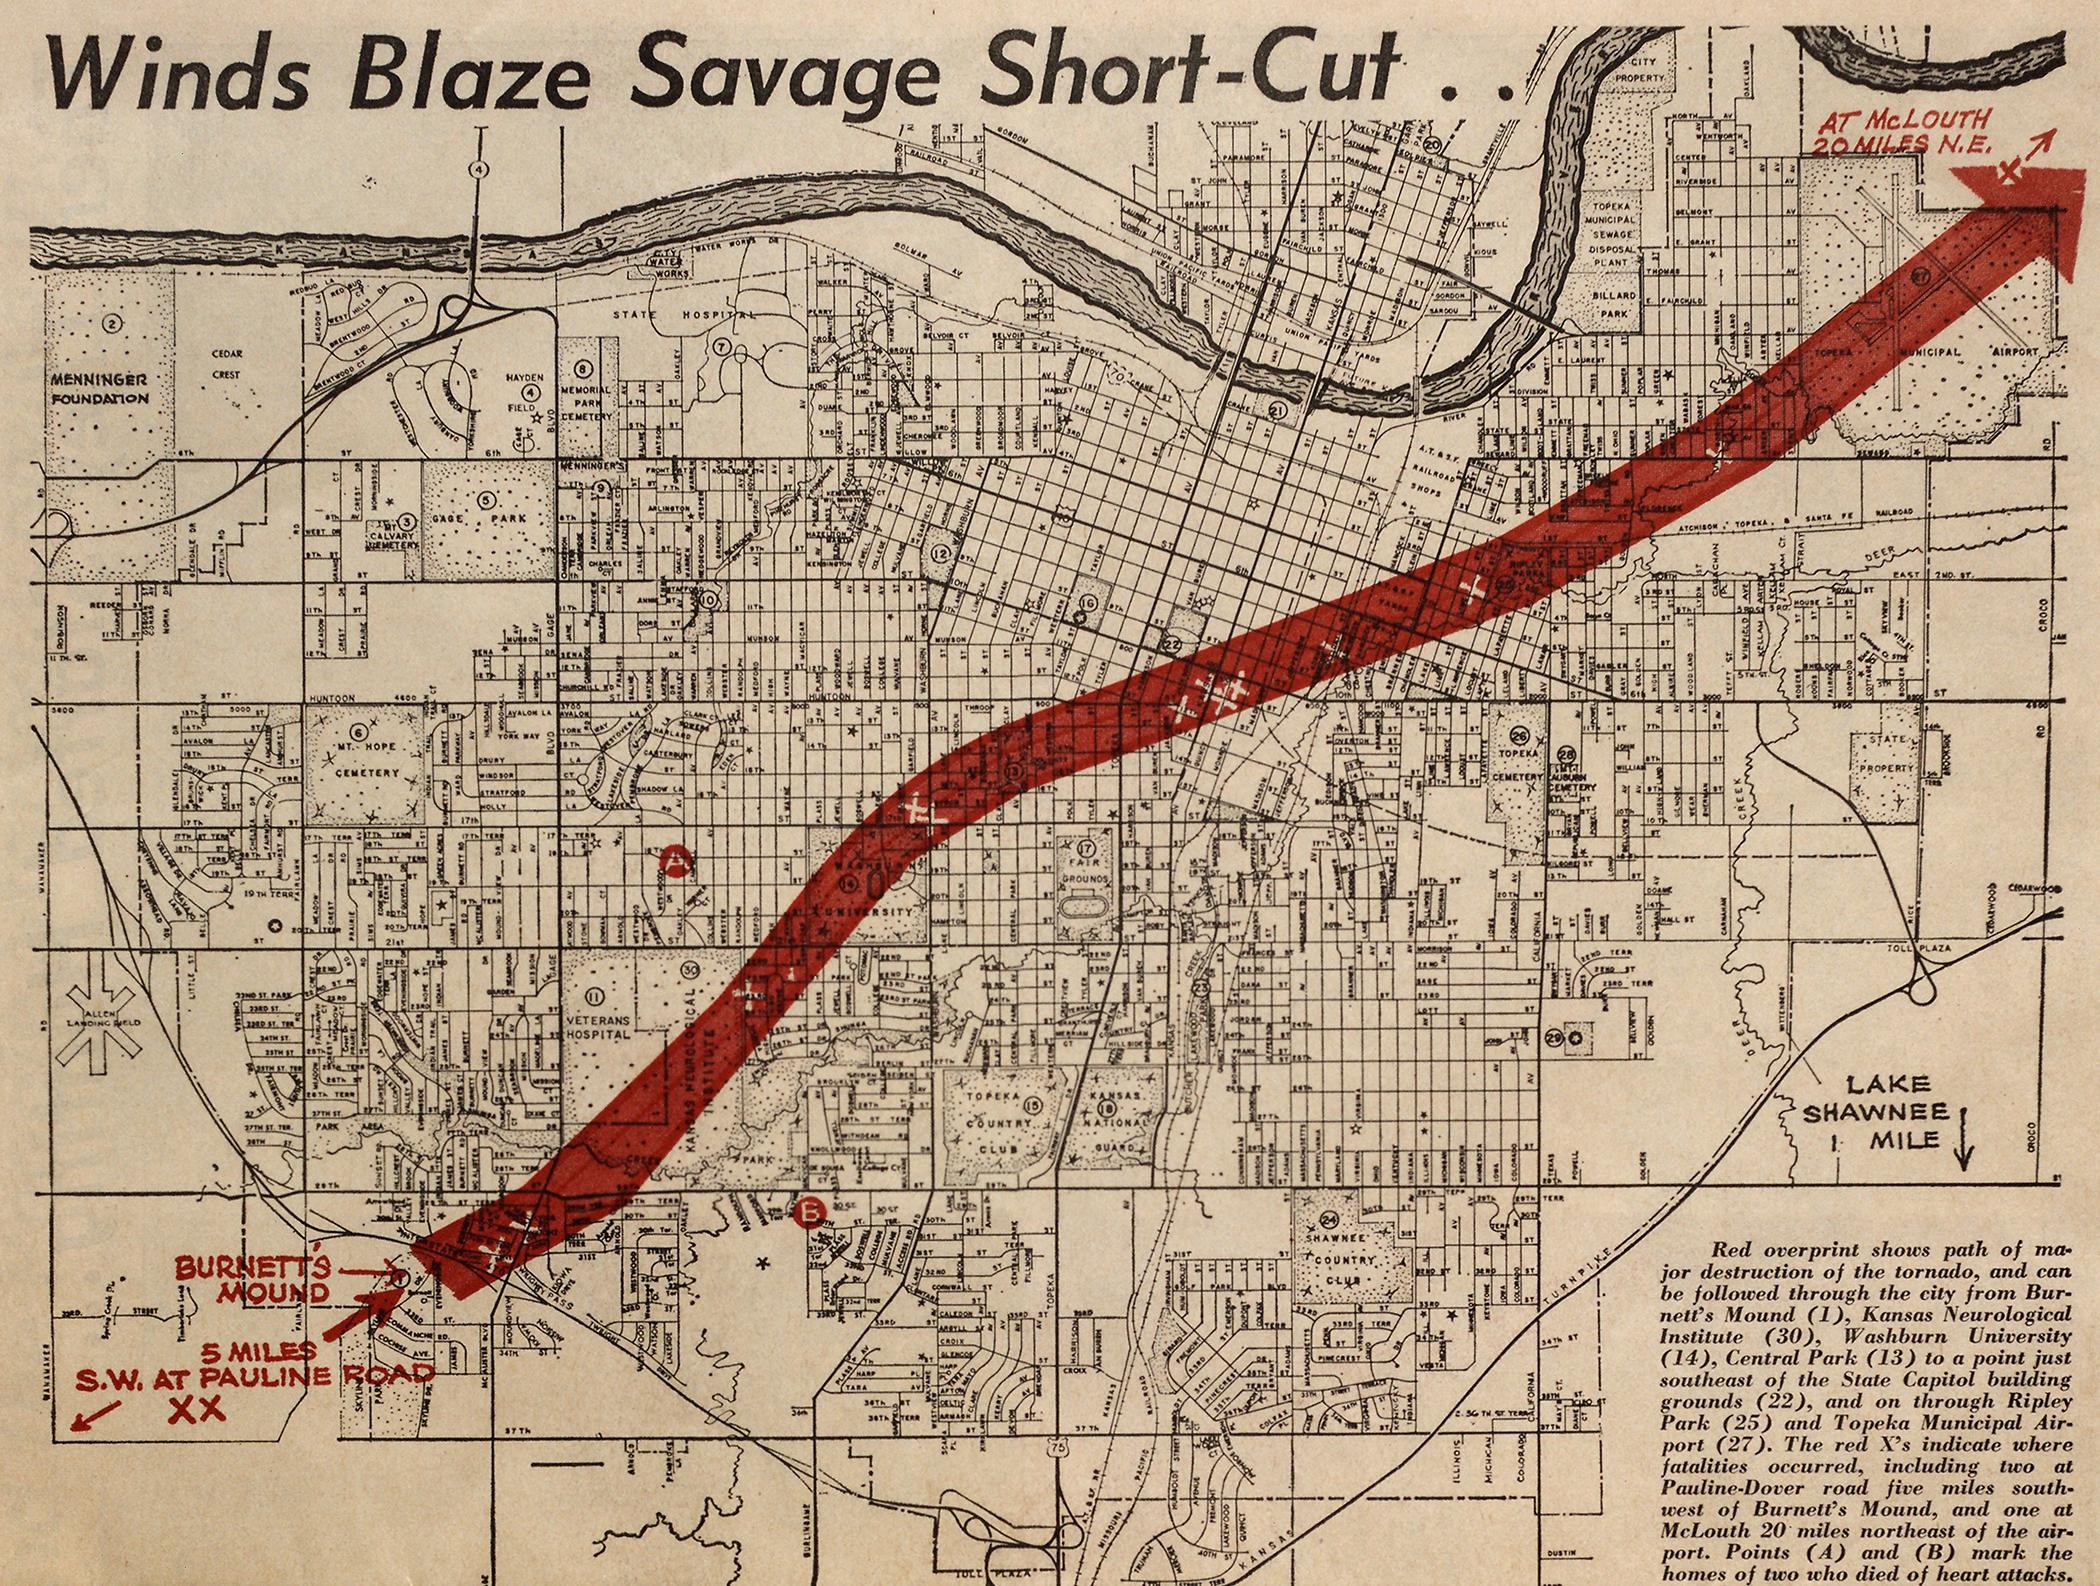 map of 1966 tornado path through Topeka